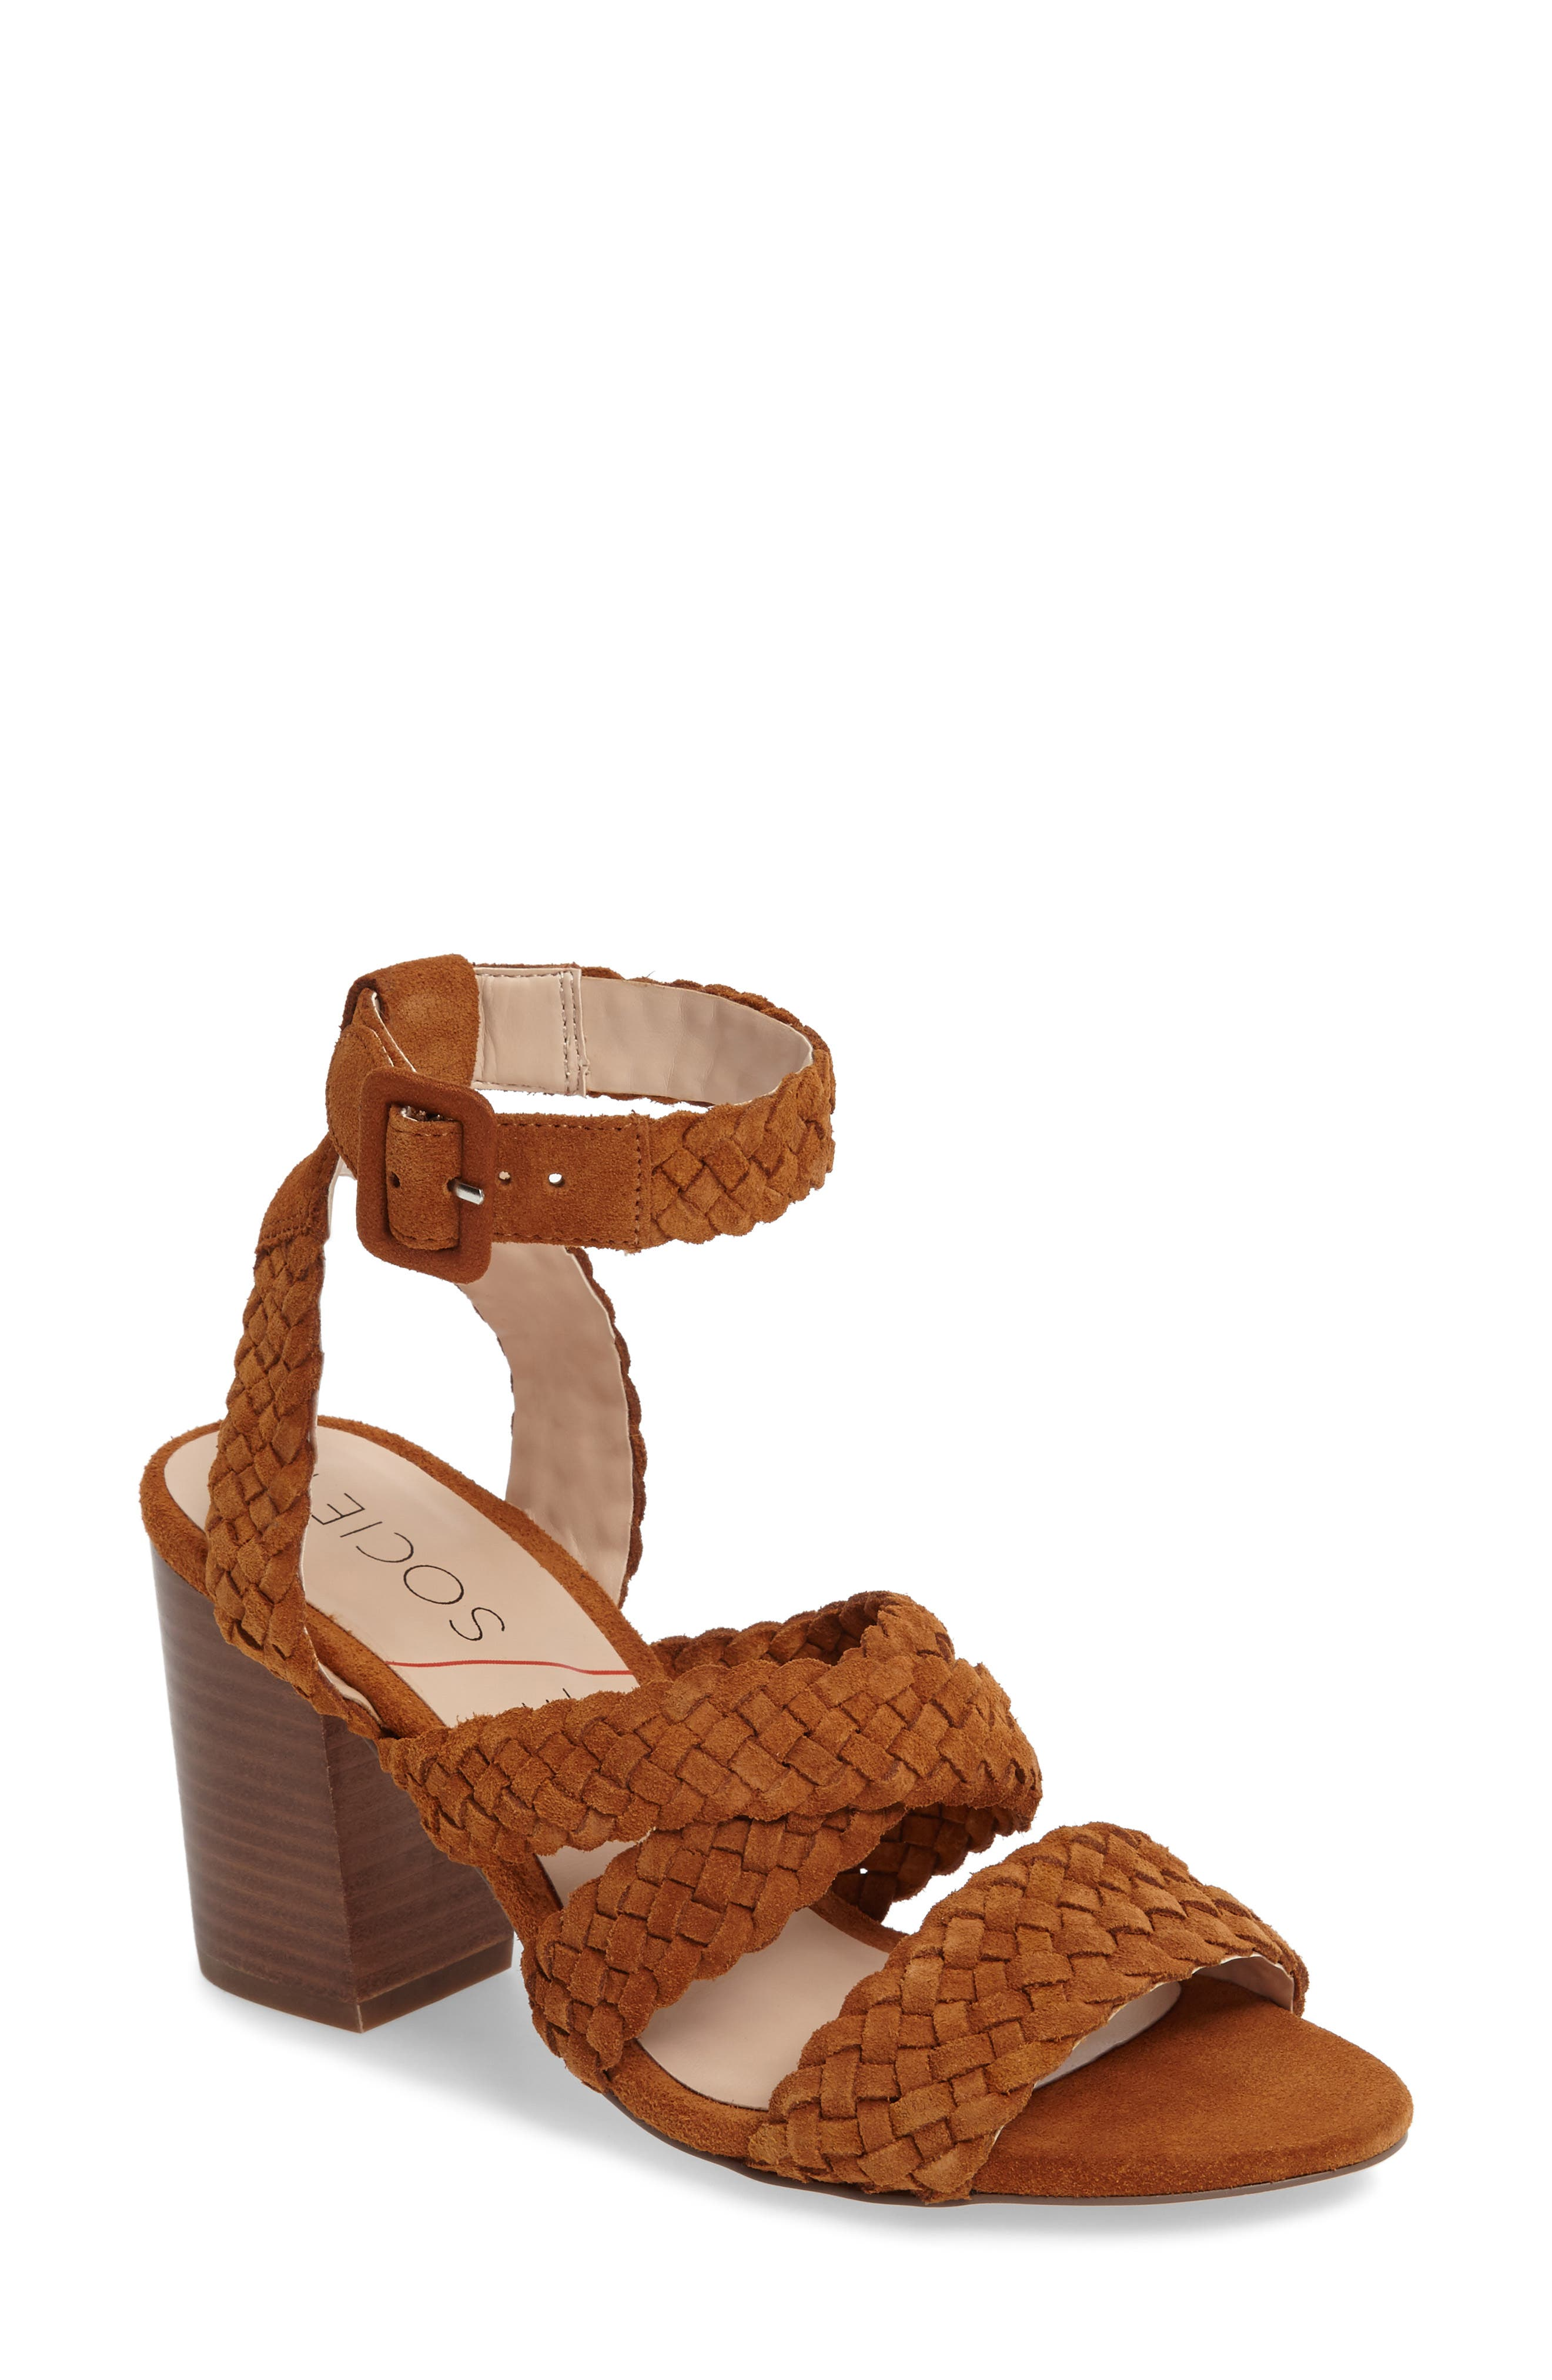 Evelina Block Heel Sandal,                         Main,                         color, Chestnut